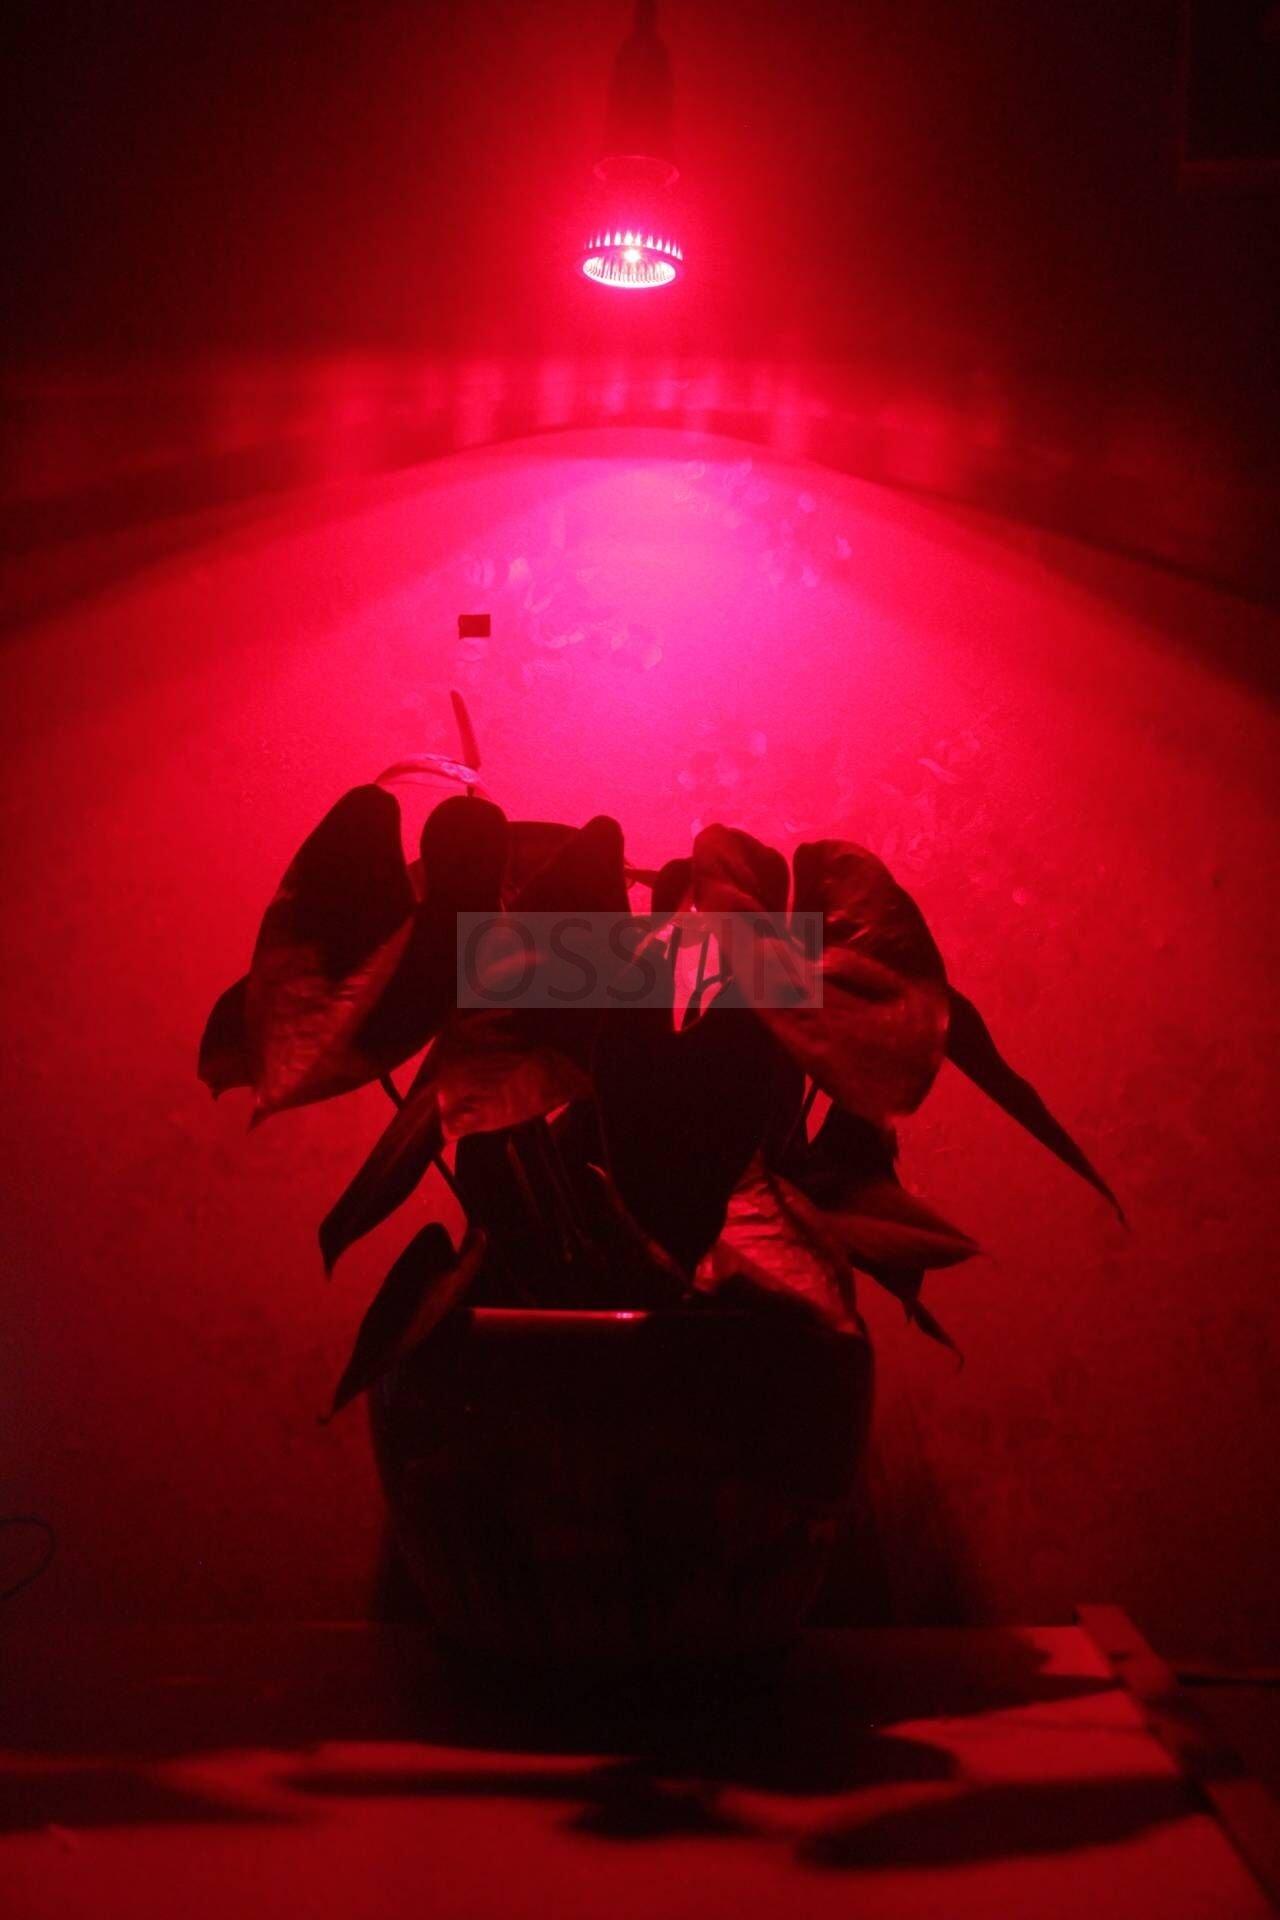 OSSUN LED Full Spectrum Plant Grow Light Bulb E26 5W Hydroponic Lamp for Indoor Flower Plants Growth Vegetable Greenhouse 85-265V,Professional (1)